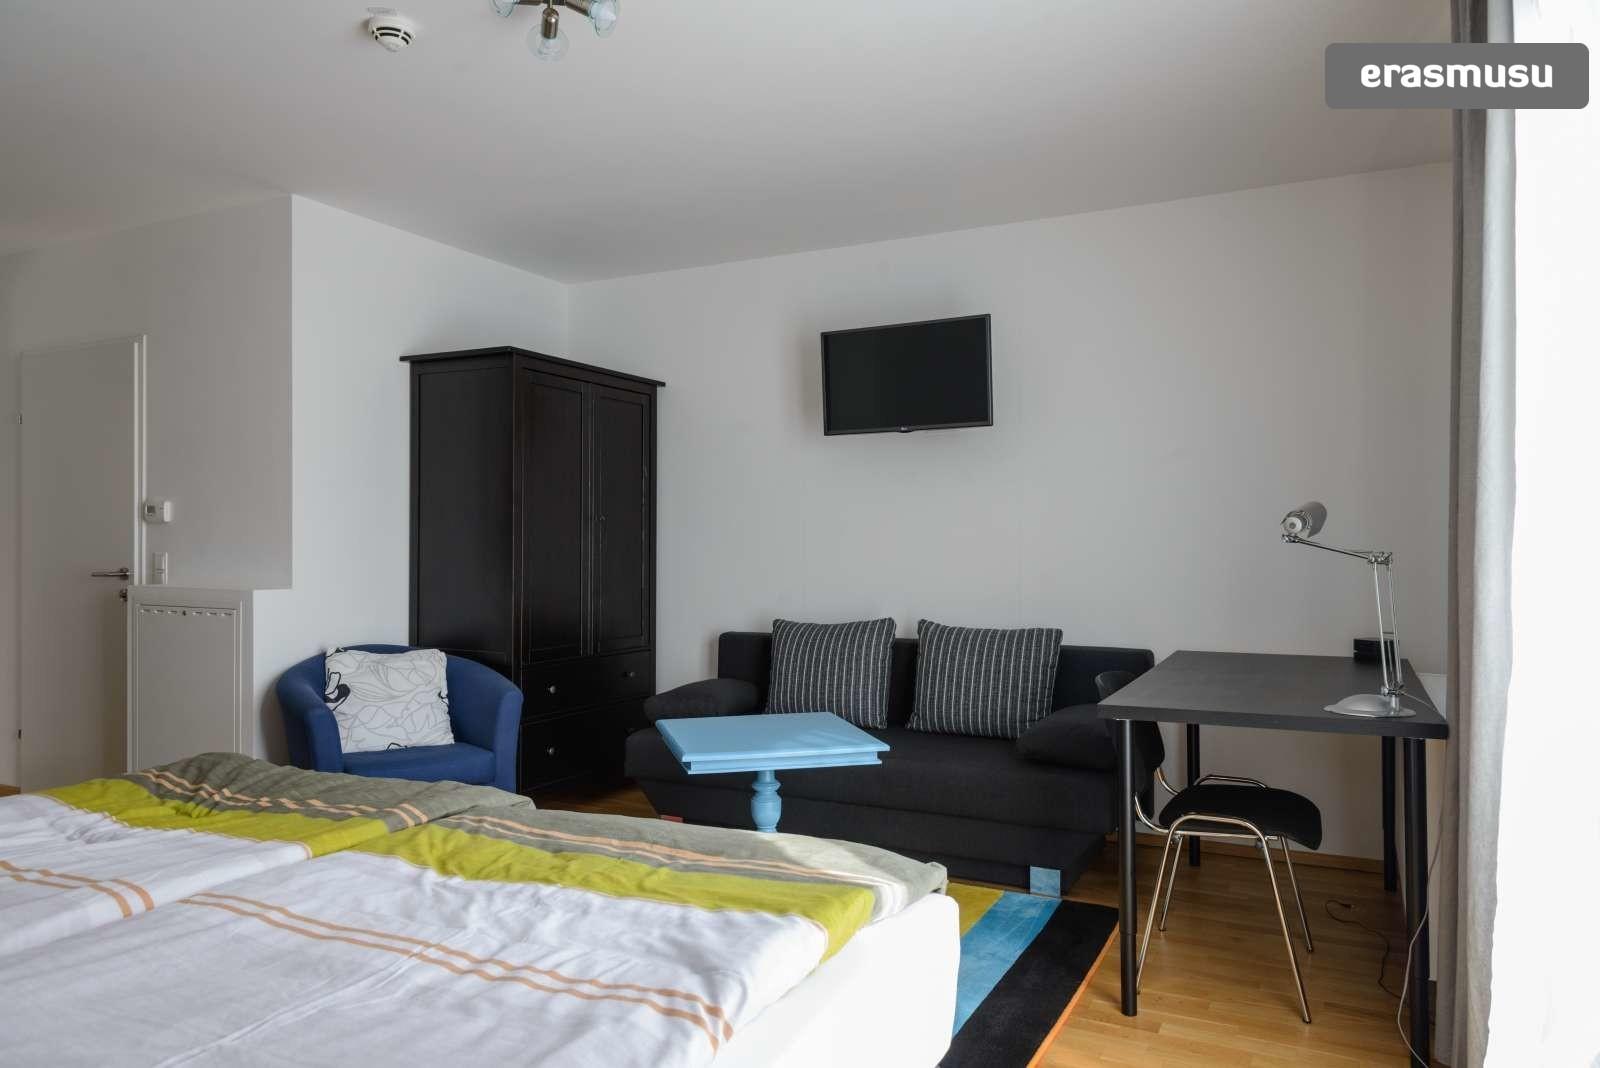 spacious-studio-apartment-rent-aspern-area-donaustadt-b28d792cd4